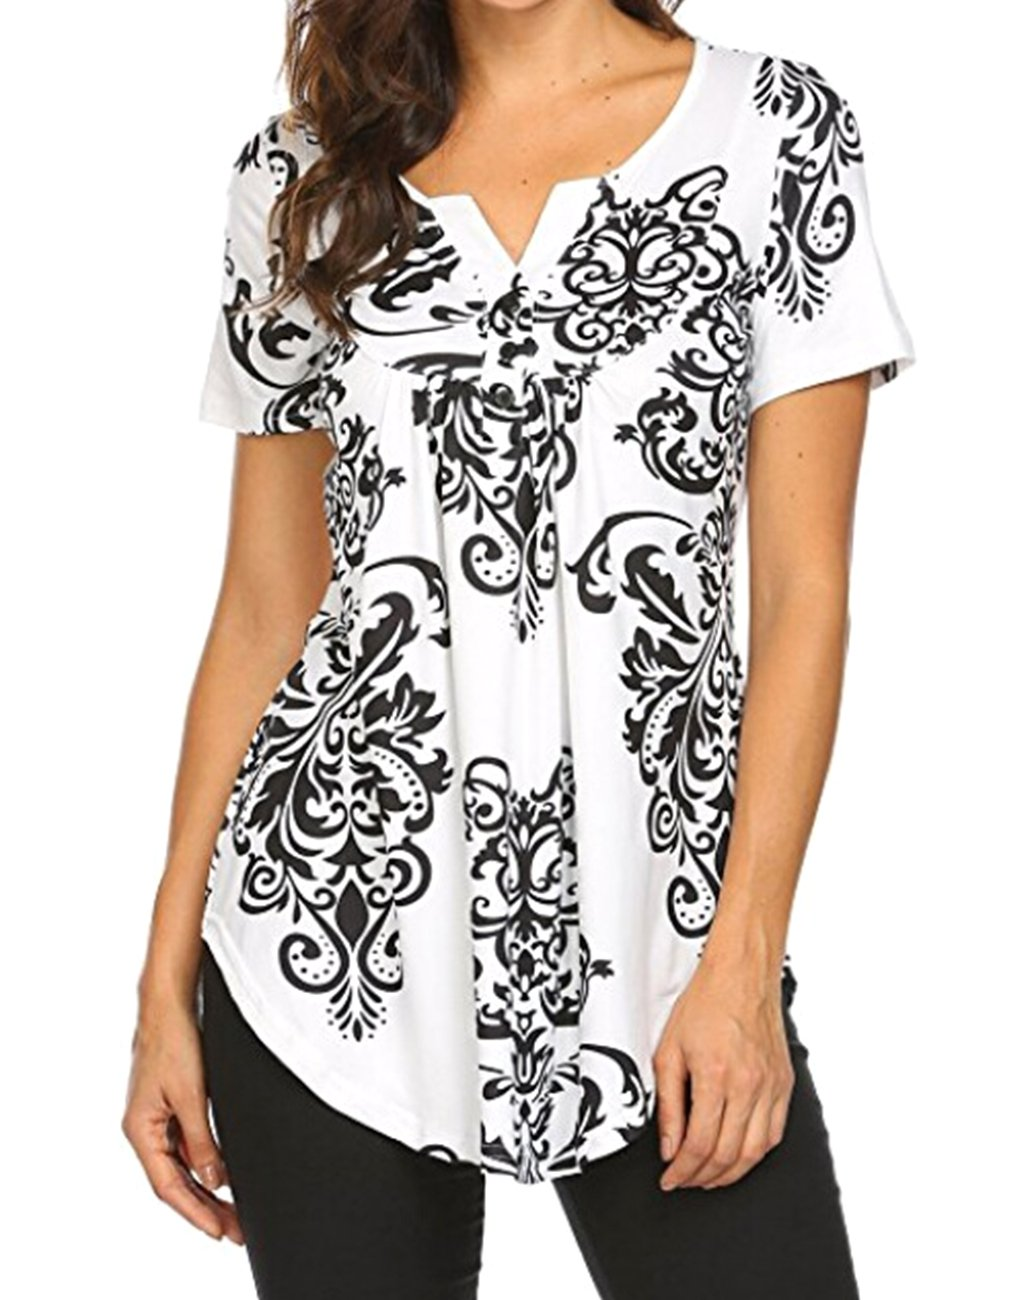 Defal Women Summer Short Sleeve V Neck Floral Print Blouses Shirts Casual Irregular Hem Flowy Lightweight Tunic Tops (Black,M)